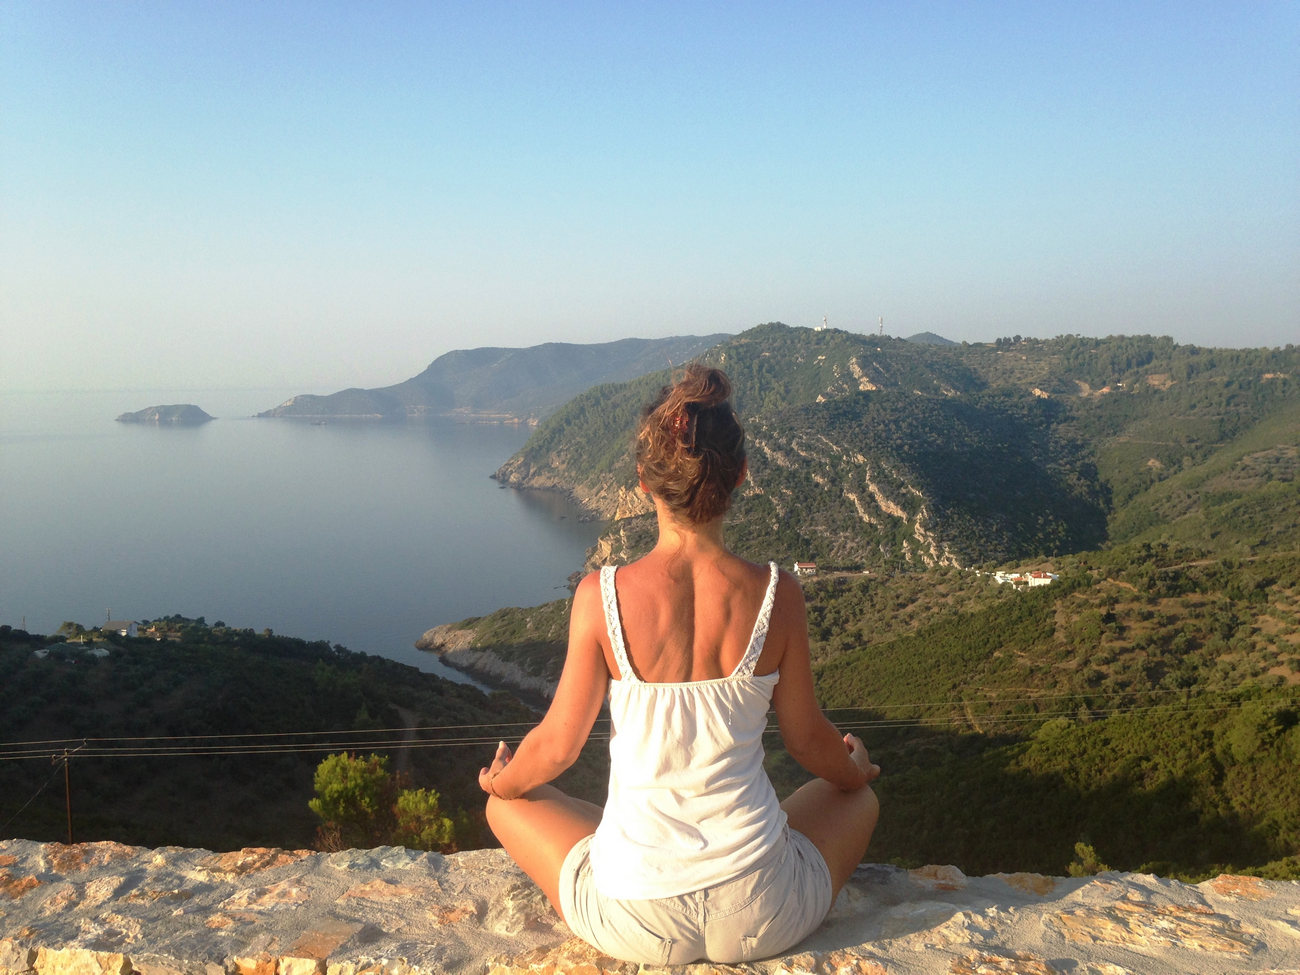 potere dating yoga incontri Midlands